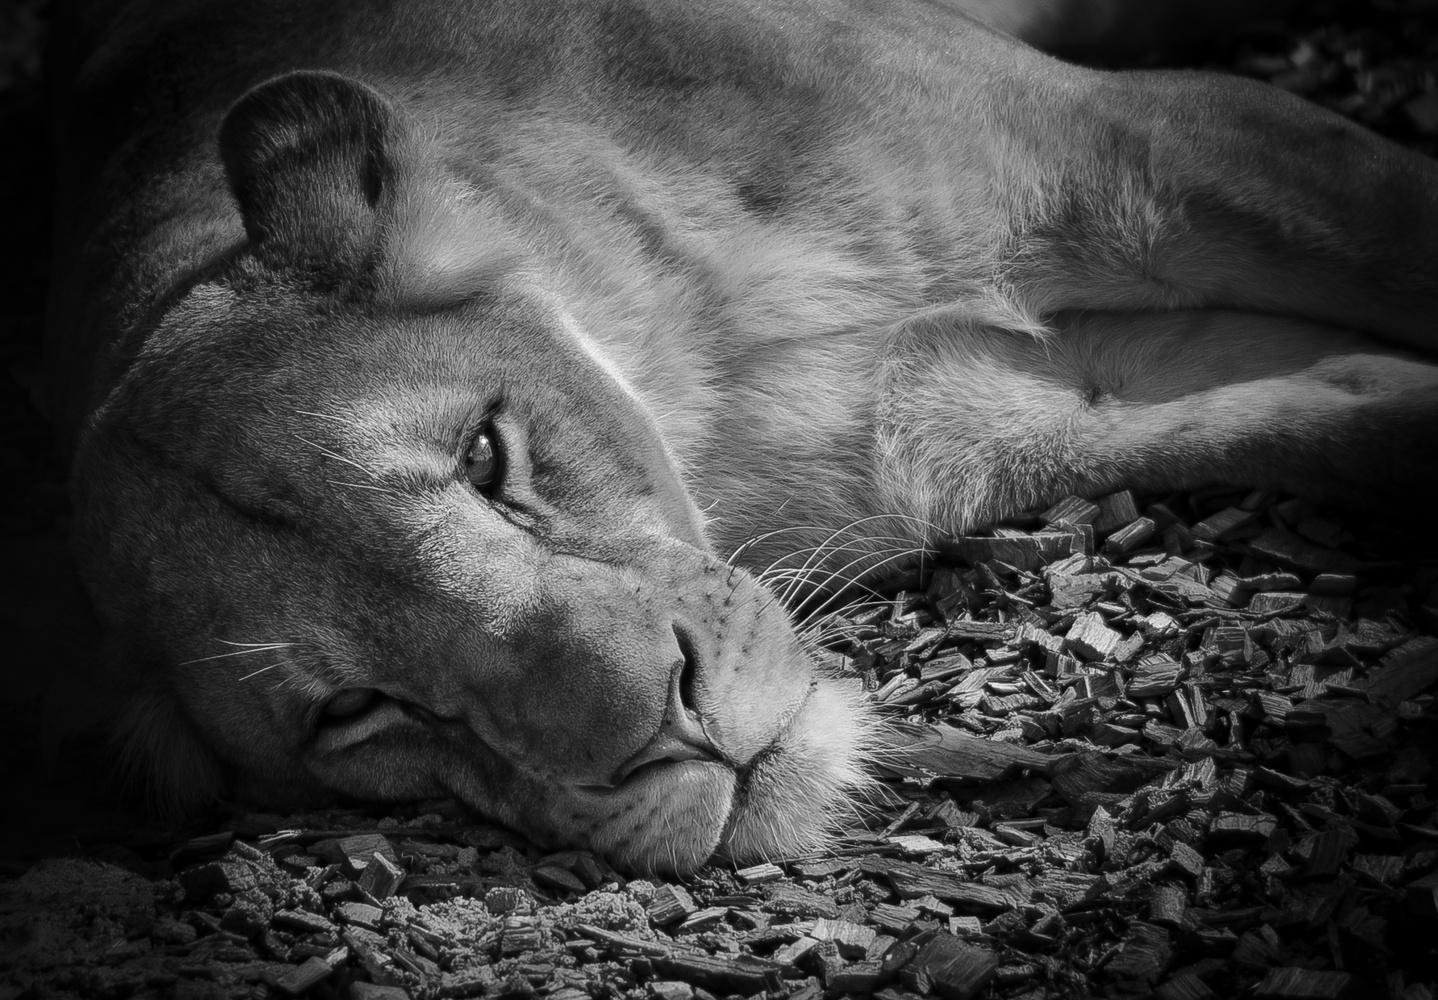 Lioness by Rene Larsen